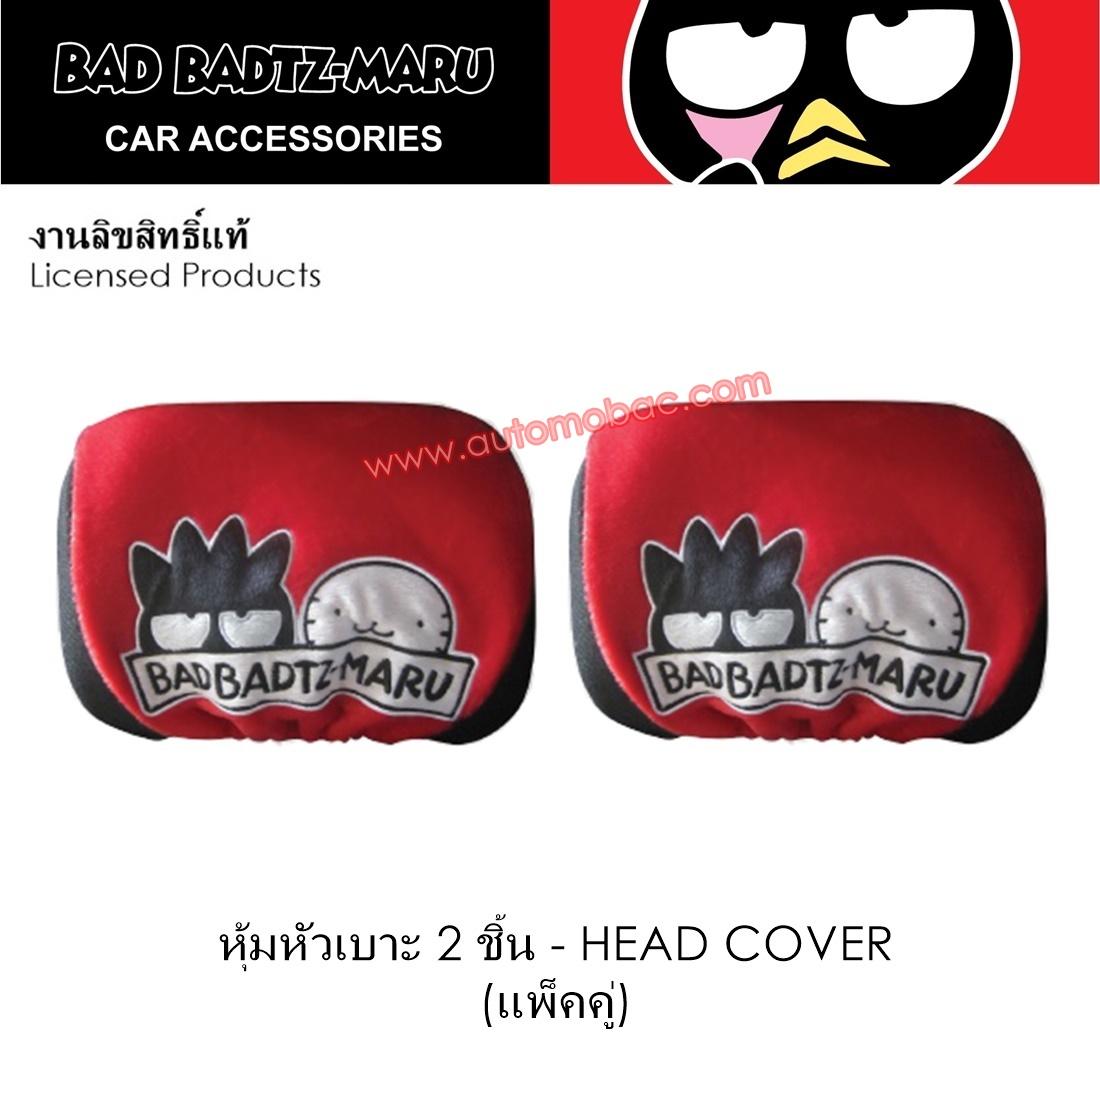 BAD BADTZ-MARU ที่หุ้มหัวเบาะ แพ็คคู่ (2ชิ้น) ใช้หุ้มหัวเบาะรถยนต์ ปกป้องจากความร้อน ลิขสิทธิ์แท้